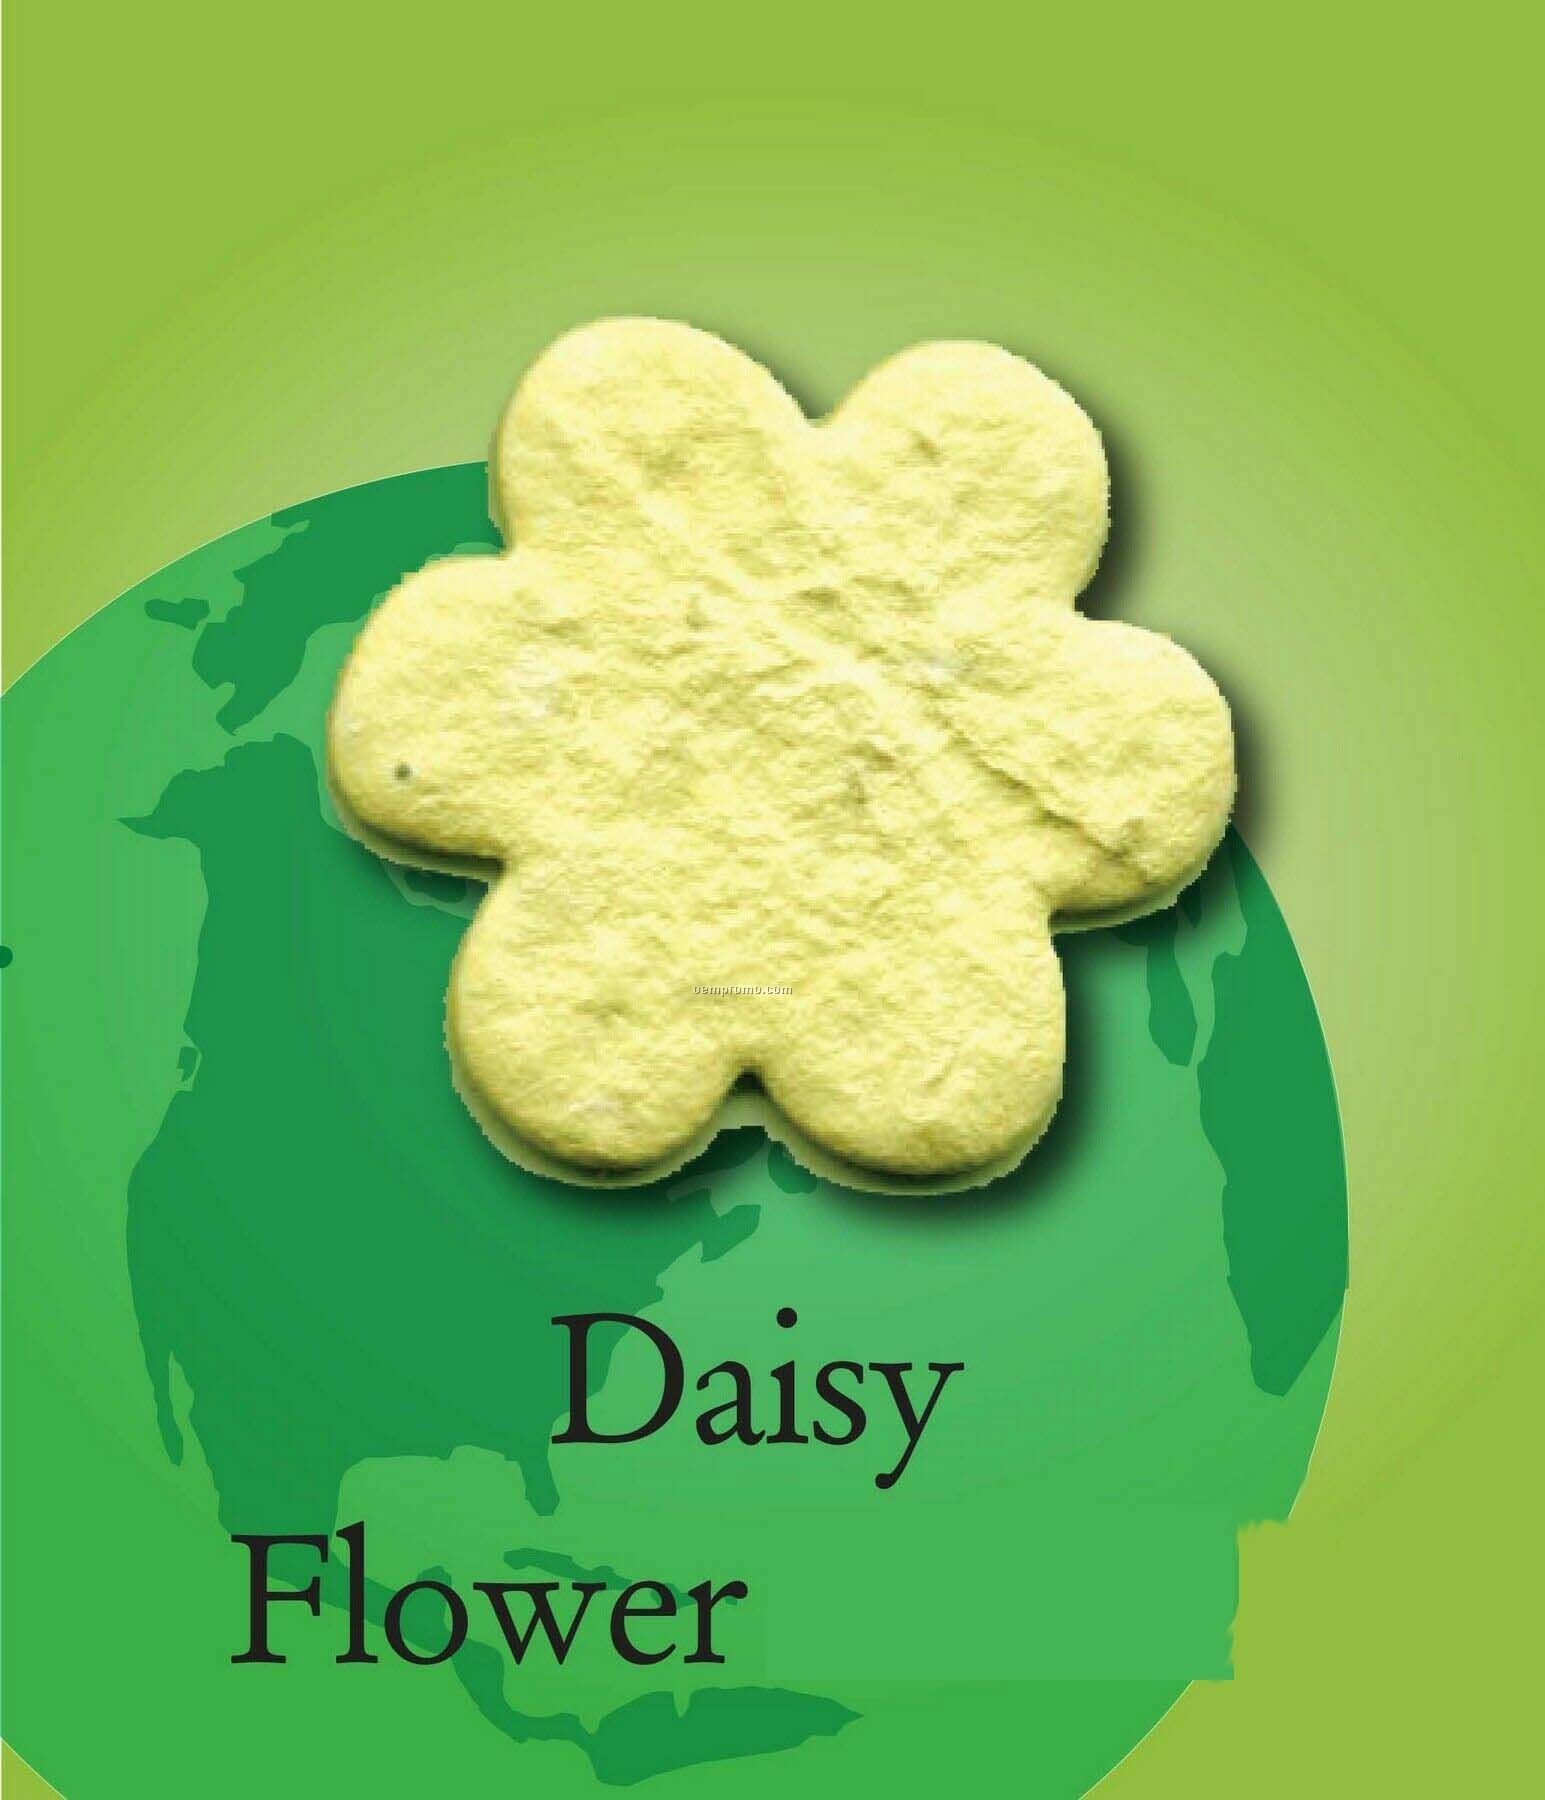 Daisy Flower Handmade Seed Plantable Mini